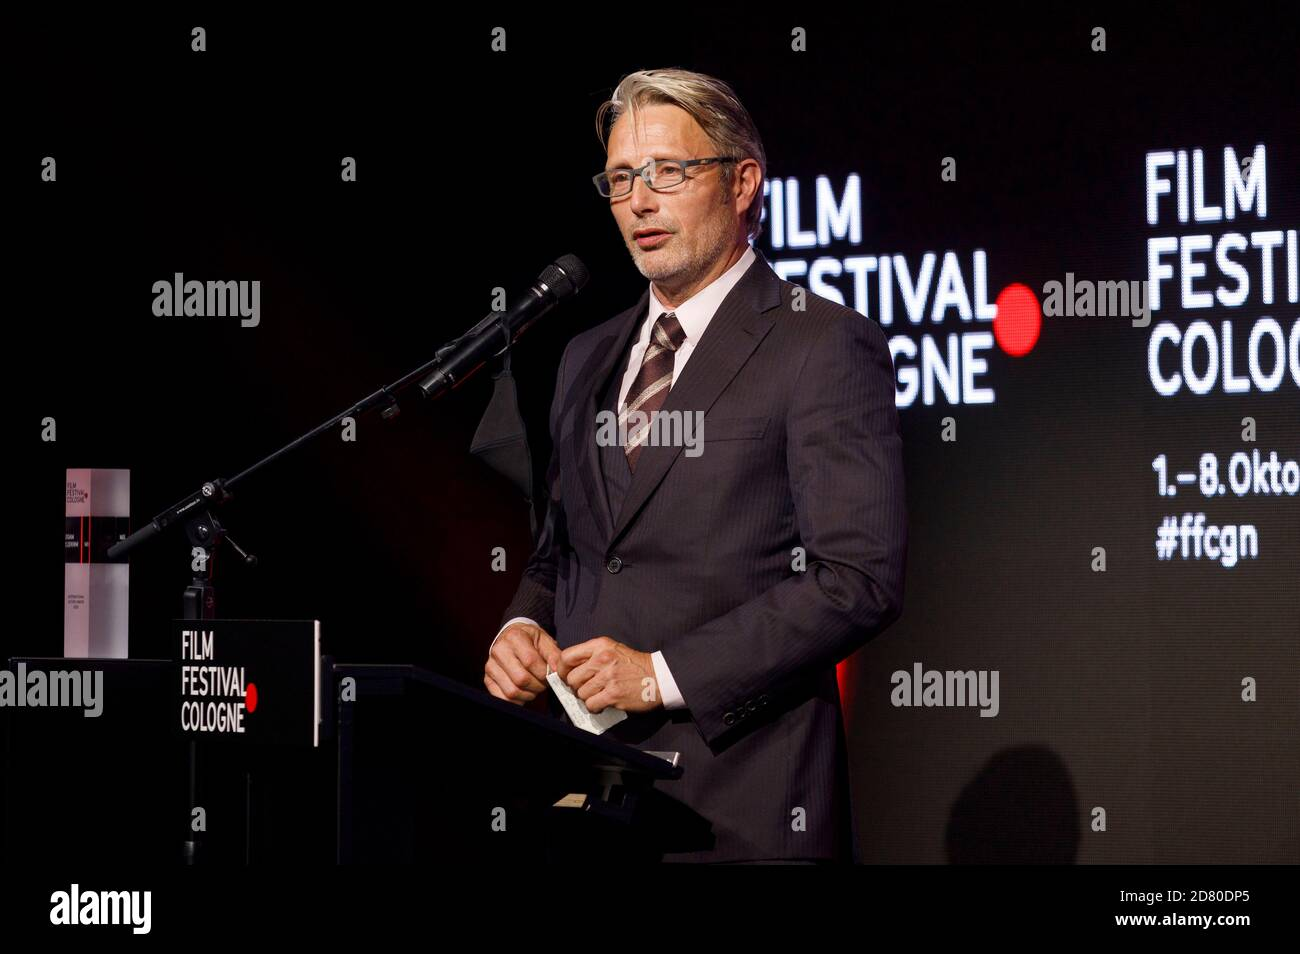 Mads Mikkelsen partecipa al Film Festival Cologne Awards 2020 al 30° Film Festival Cologne 2020 a Palladium l'8 ottobre 2020 a Colonia, Germania Foto Stock